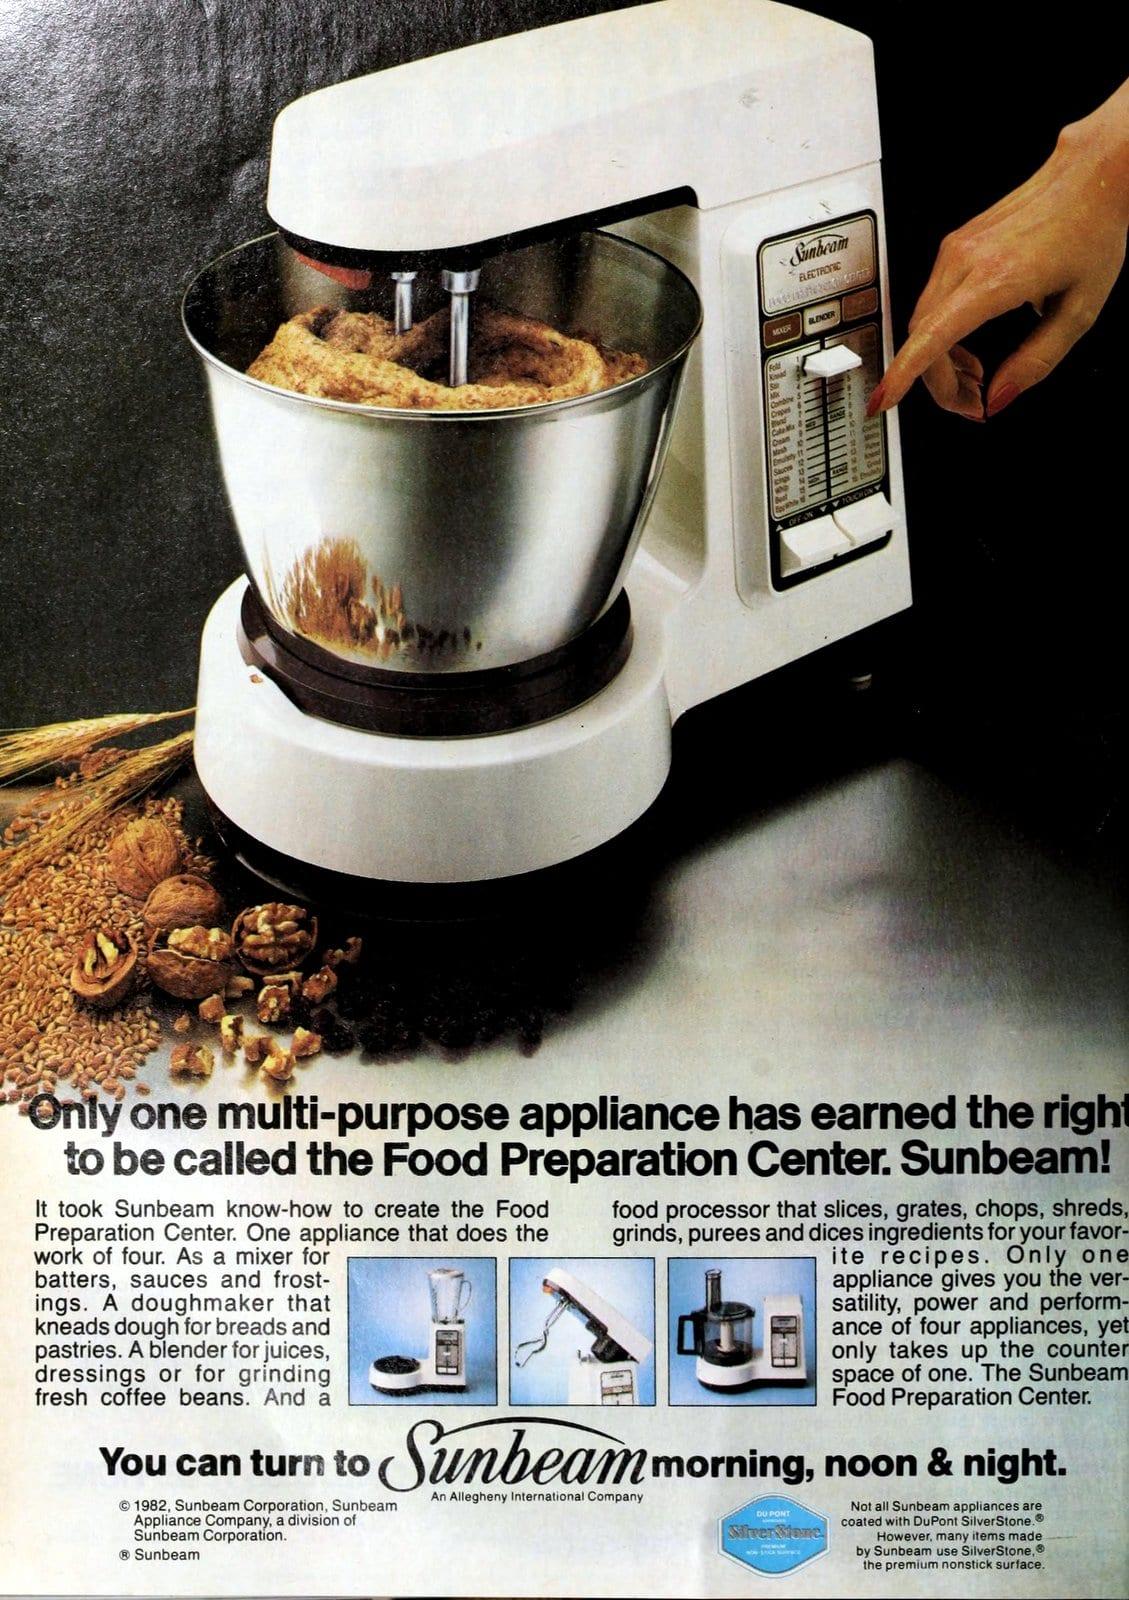 Vintage Sunbeam Food Preparation Center stand mixer (1982)